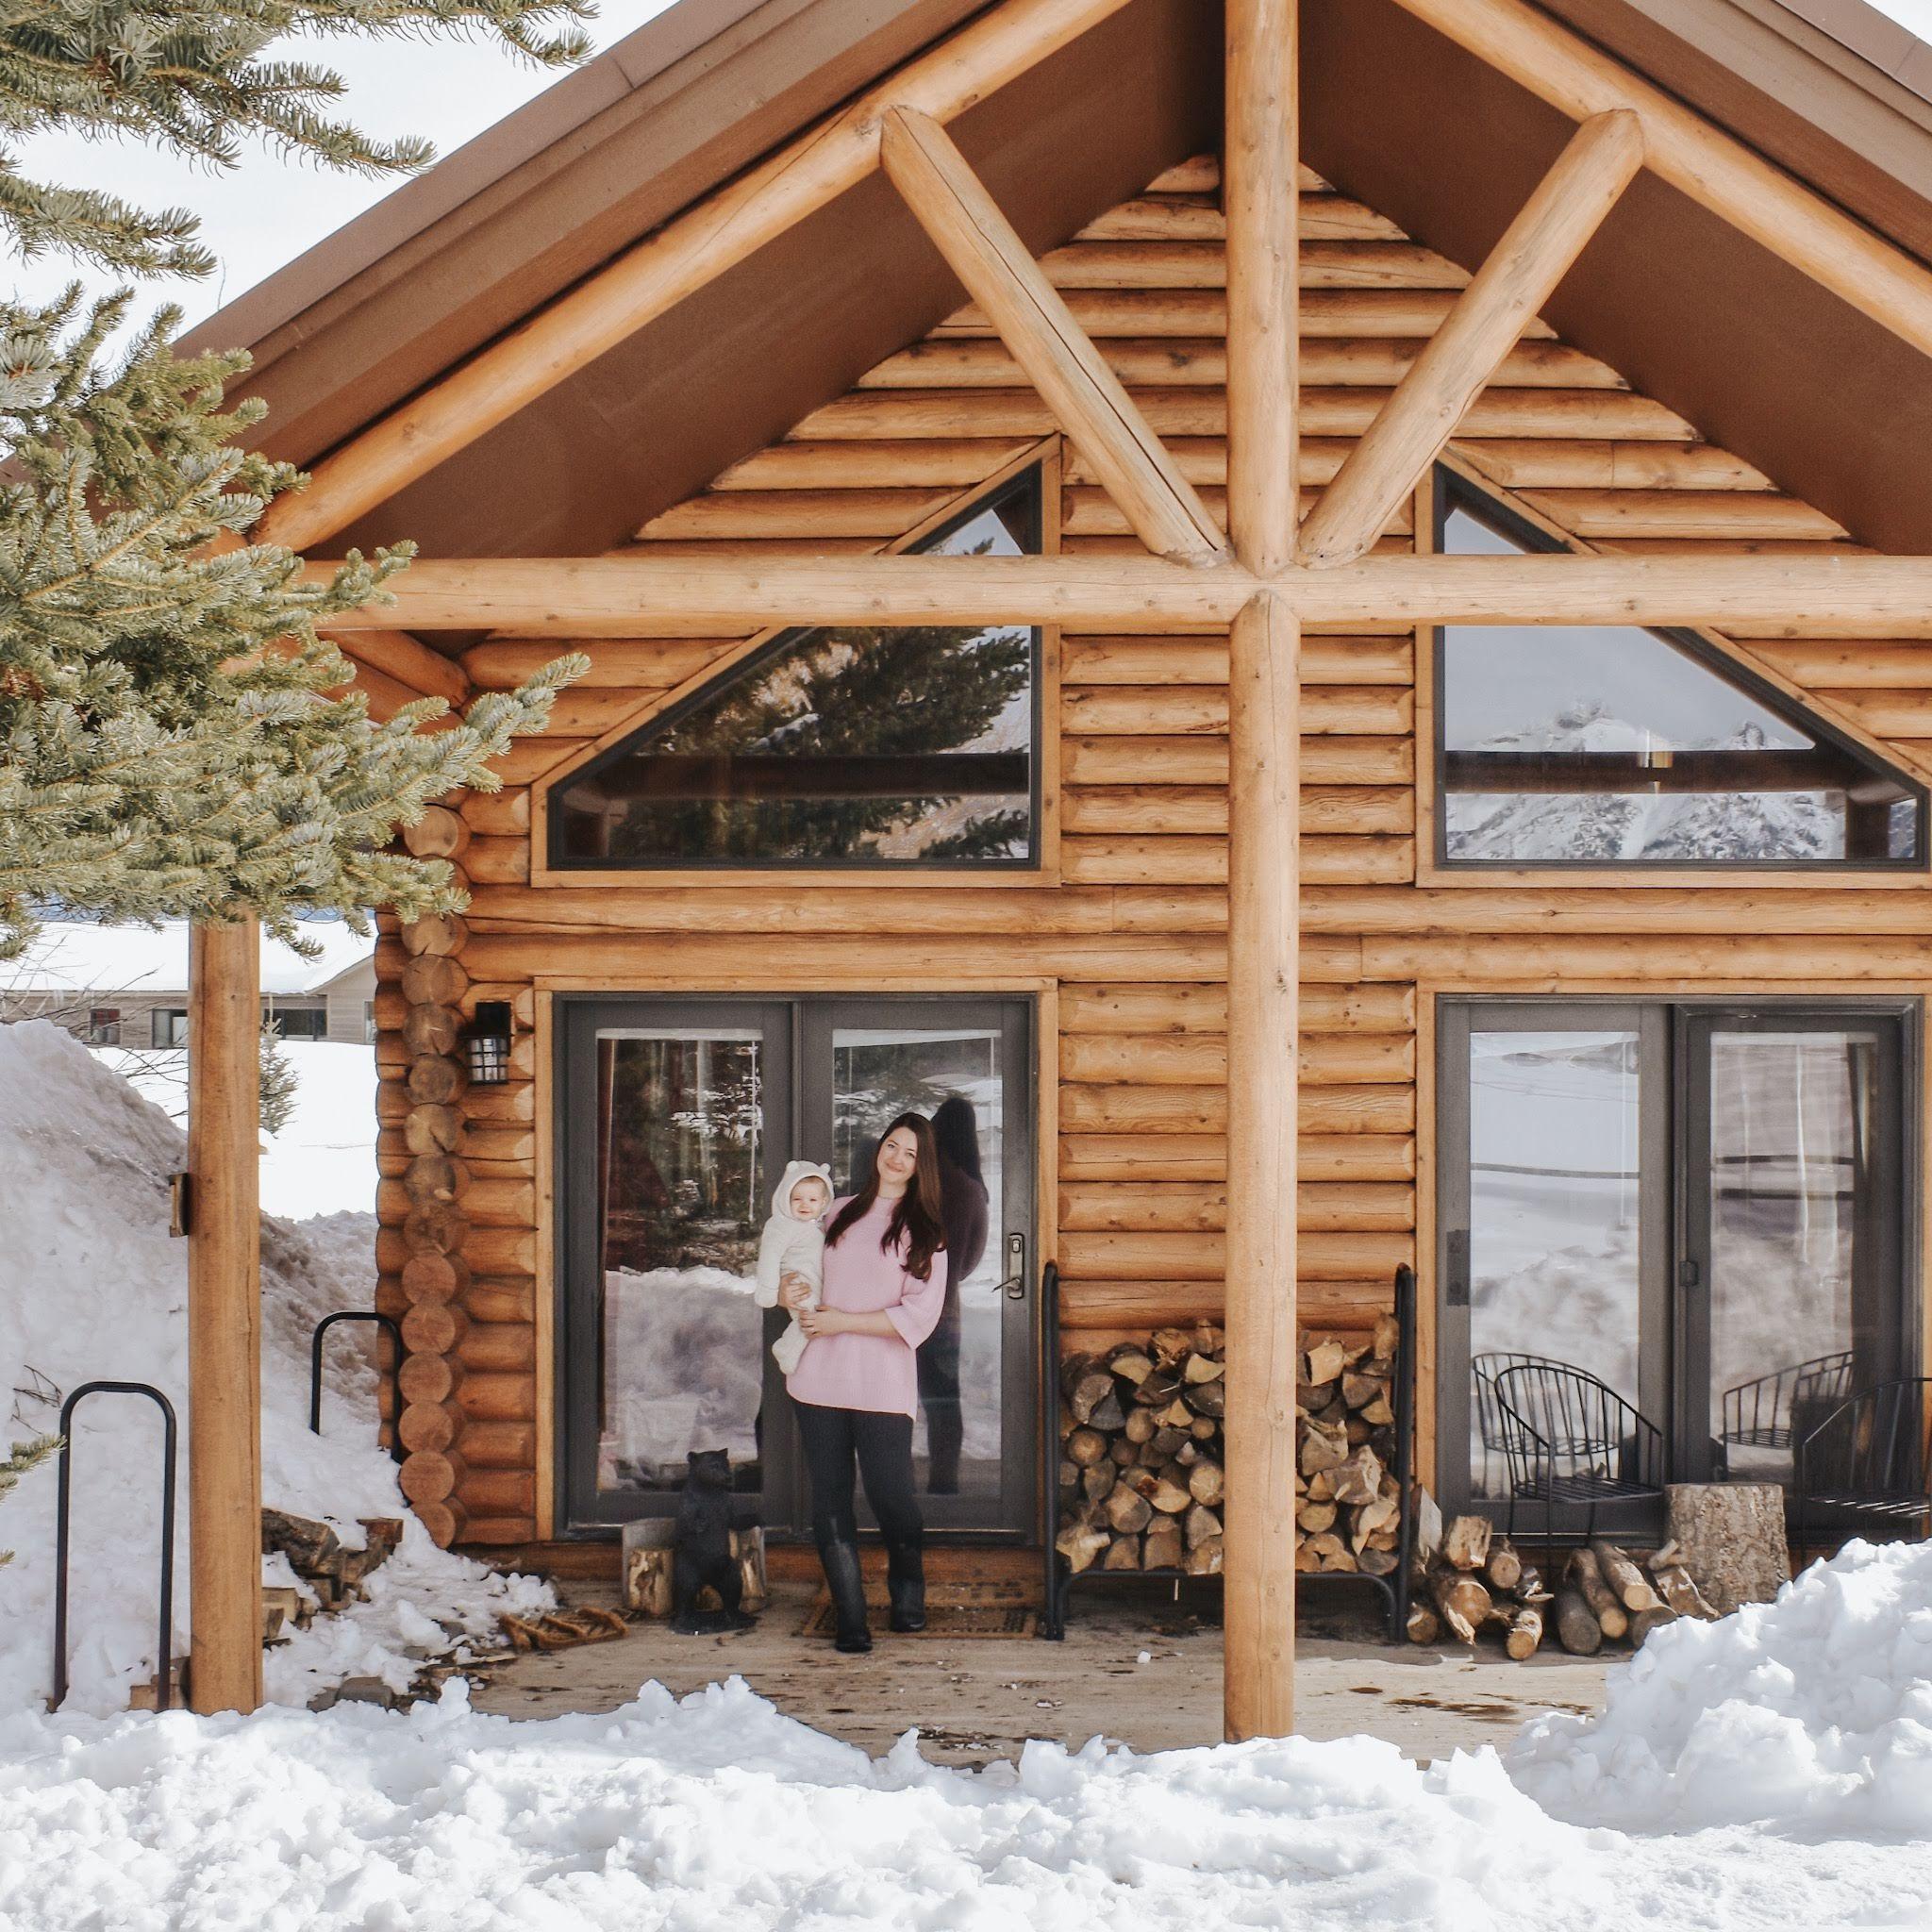 Daily Cabin Life In Jackson Hole Wy Cabin Life Cabin Little Log Cabin